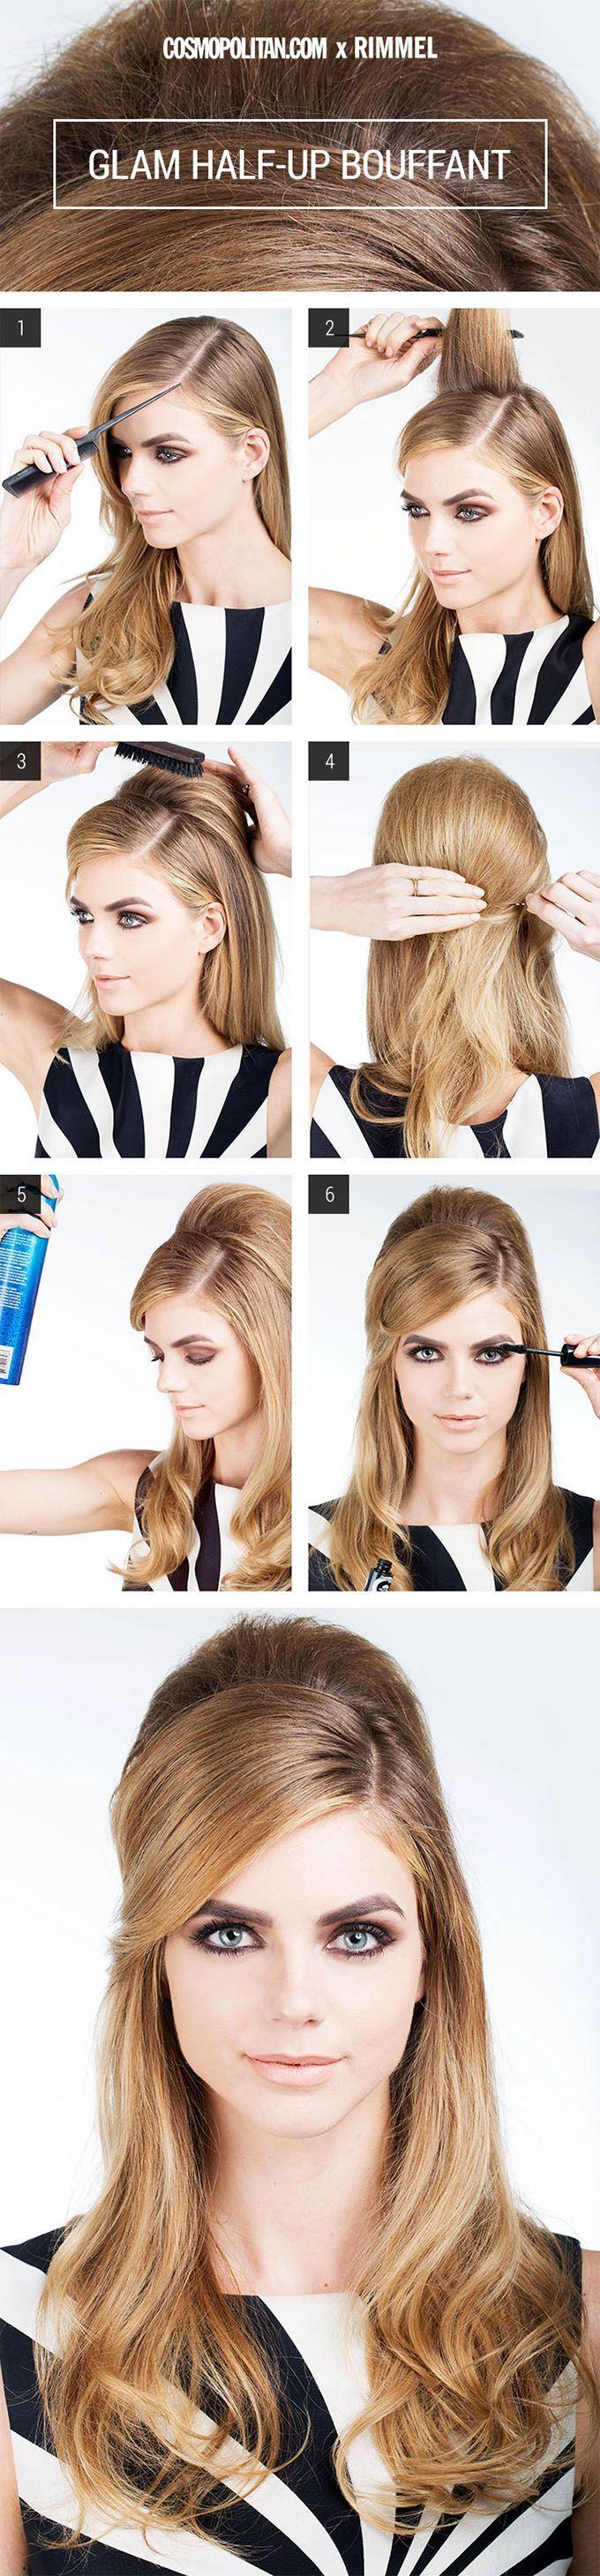 Halloween hair diy hair tutorials hair romance clothes and